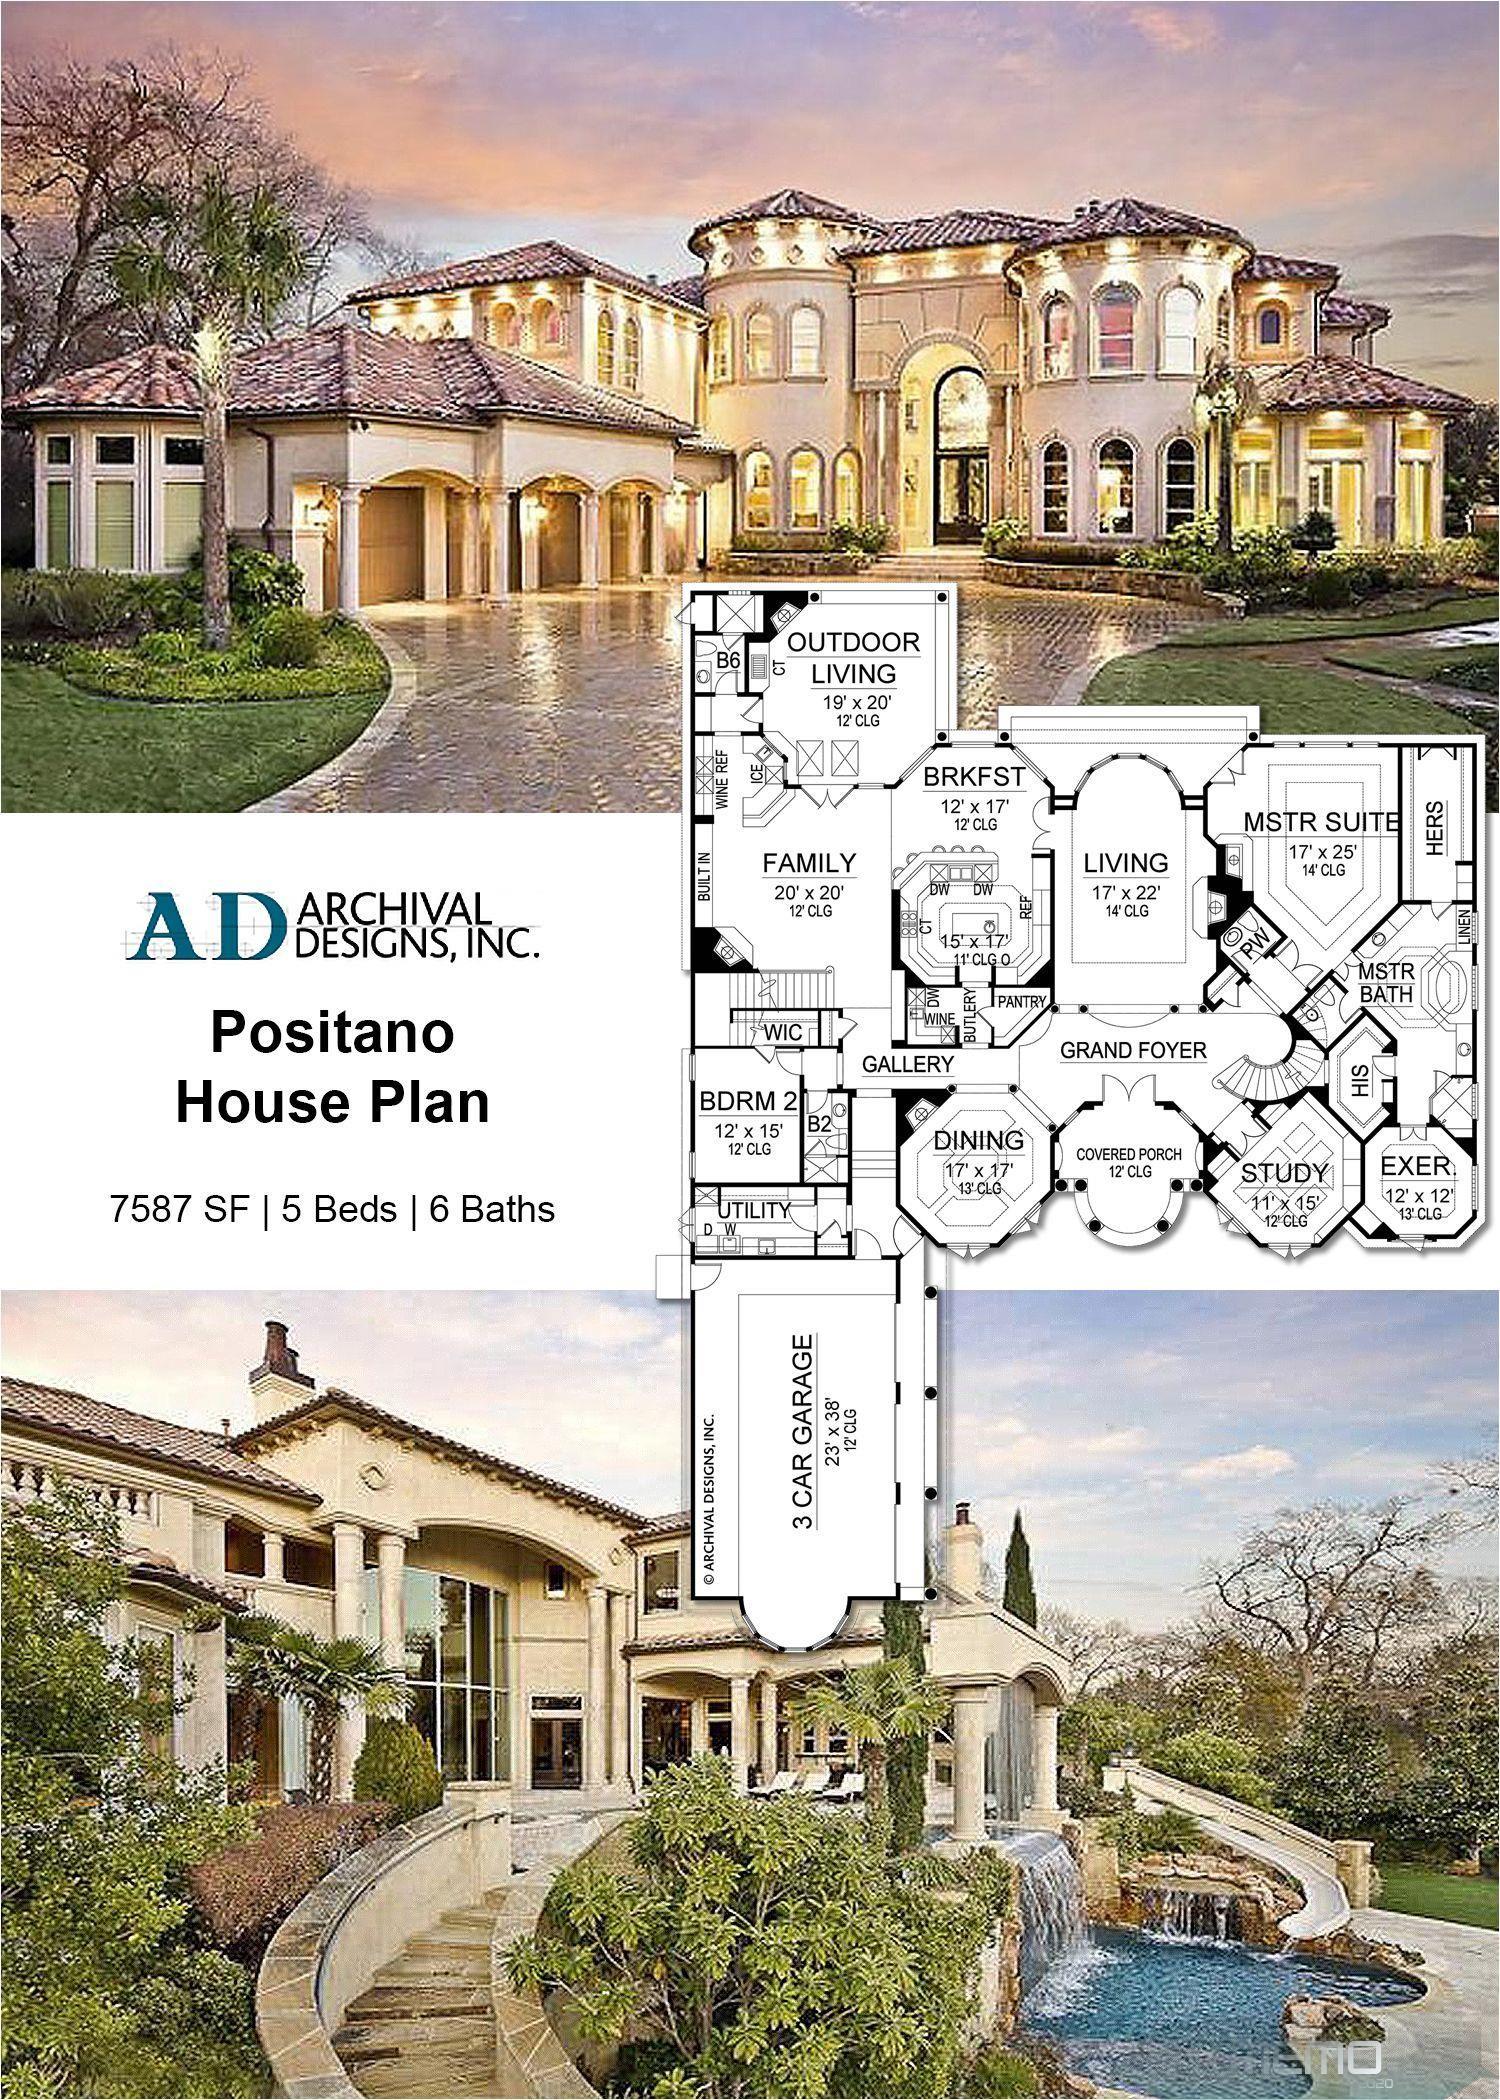 Jun 19 2019 Elegant Luxury Abounds In This Mediterranean Mansion House Plan Total L House Plans Mansion Luxury House Floor Plans Mediterranean House Plans